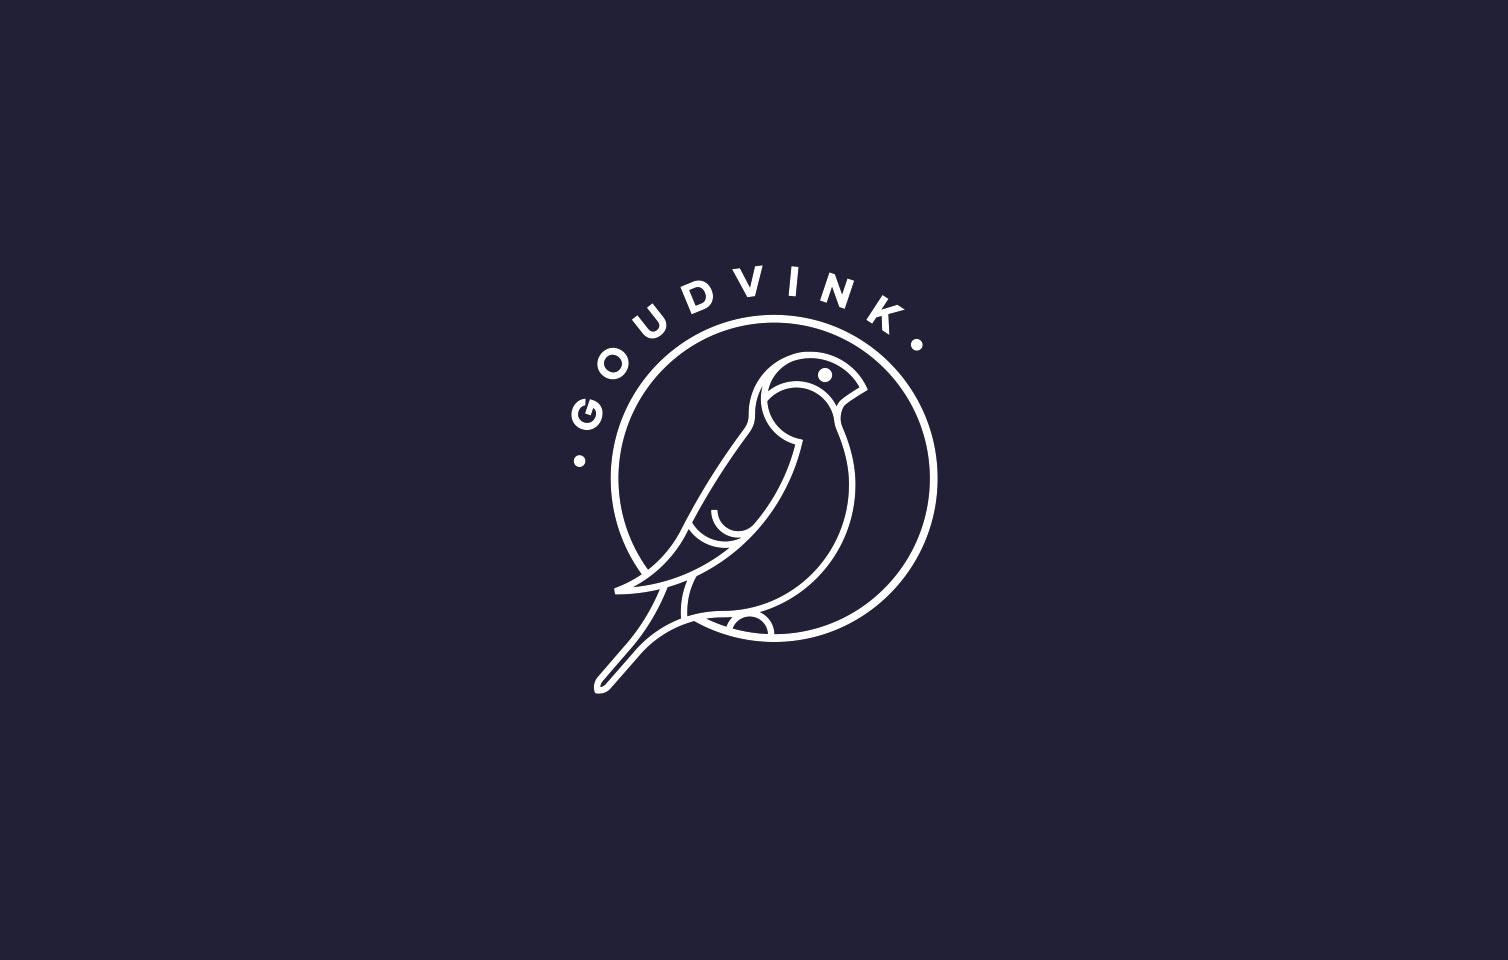 goudvink_logo.jpg